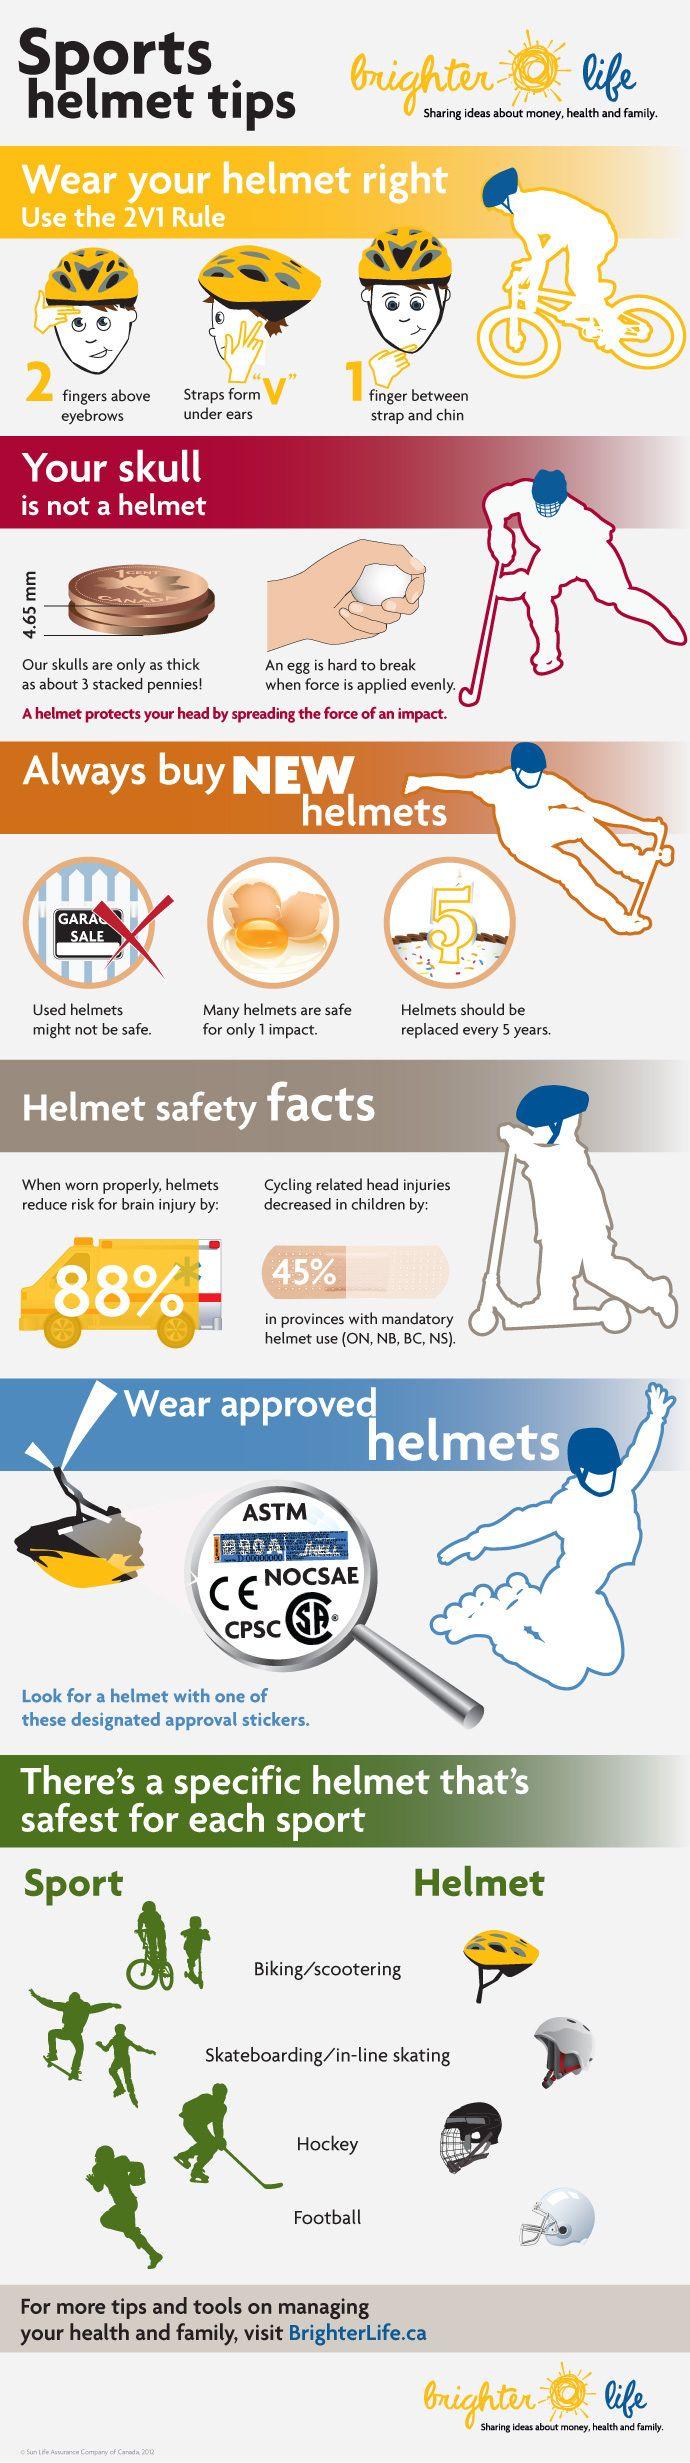 Sports helmet safety tips